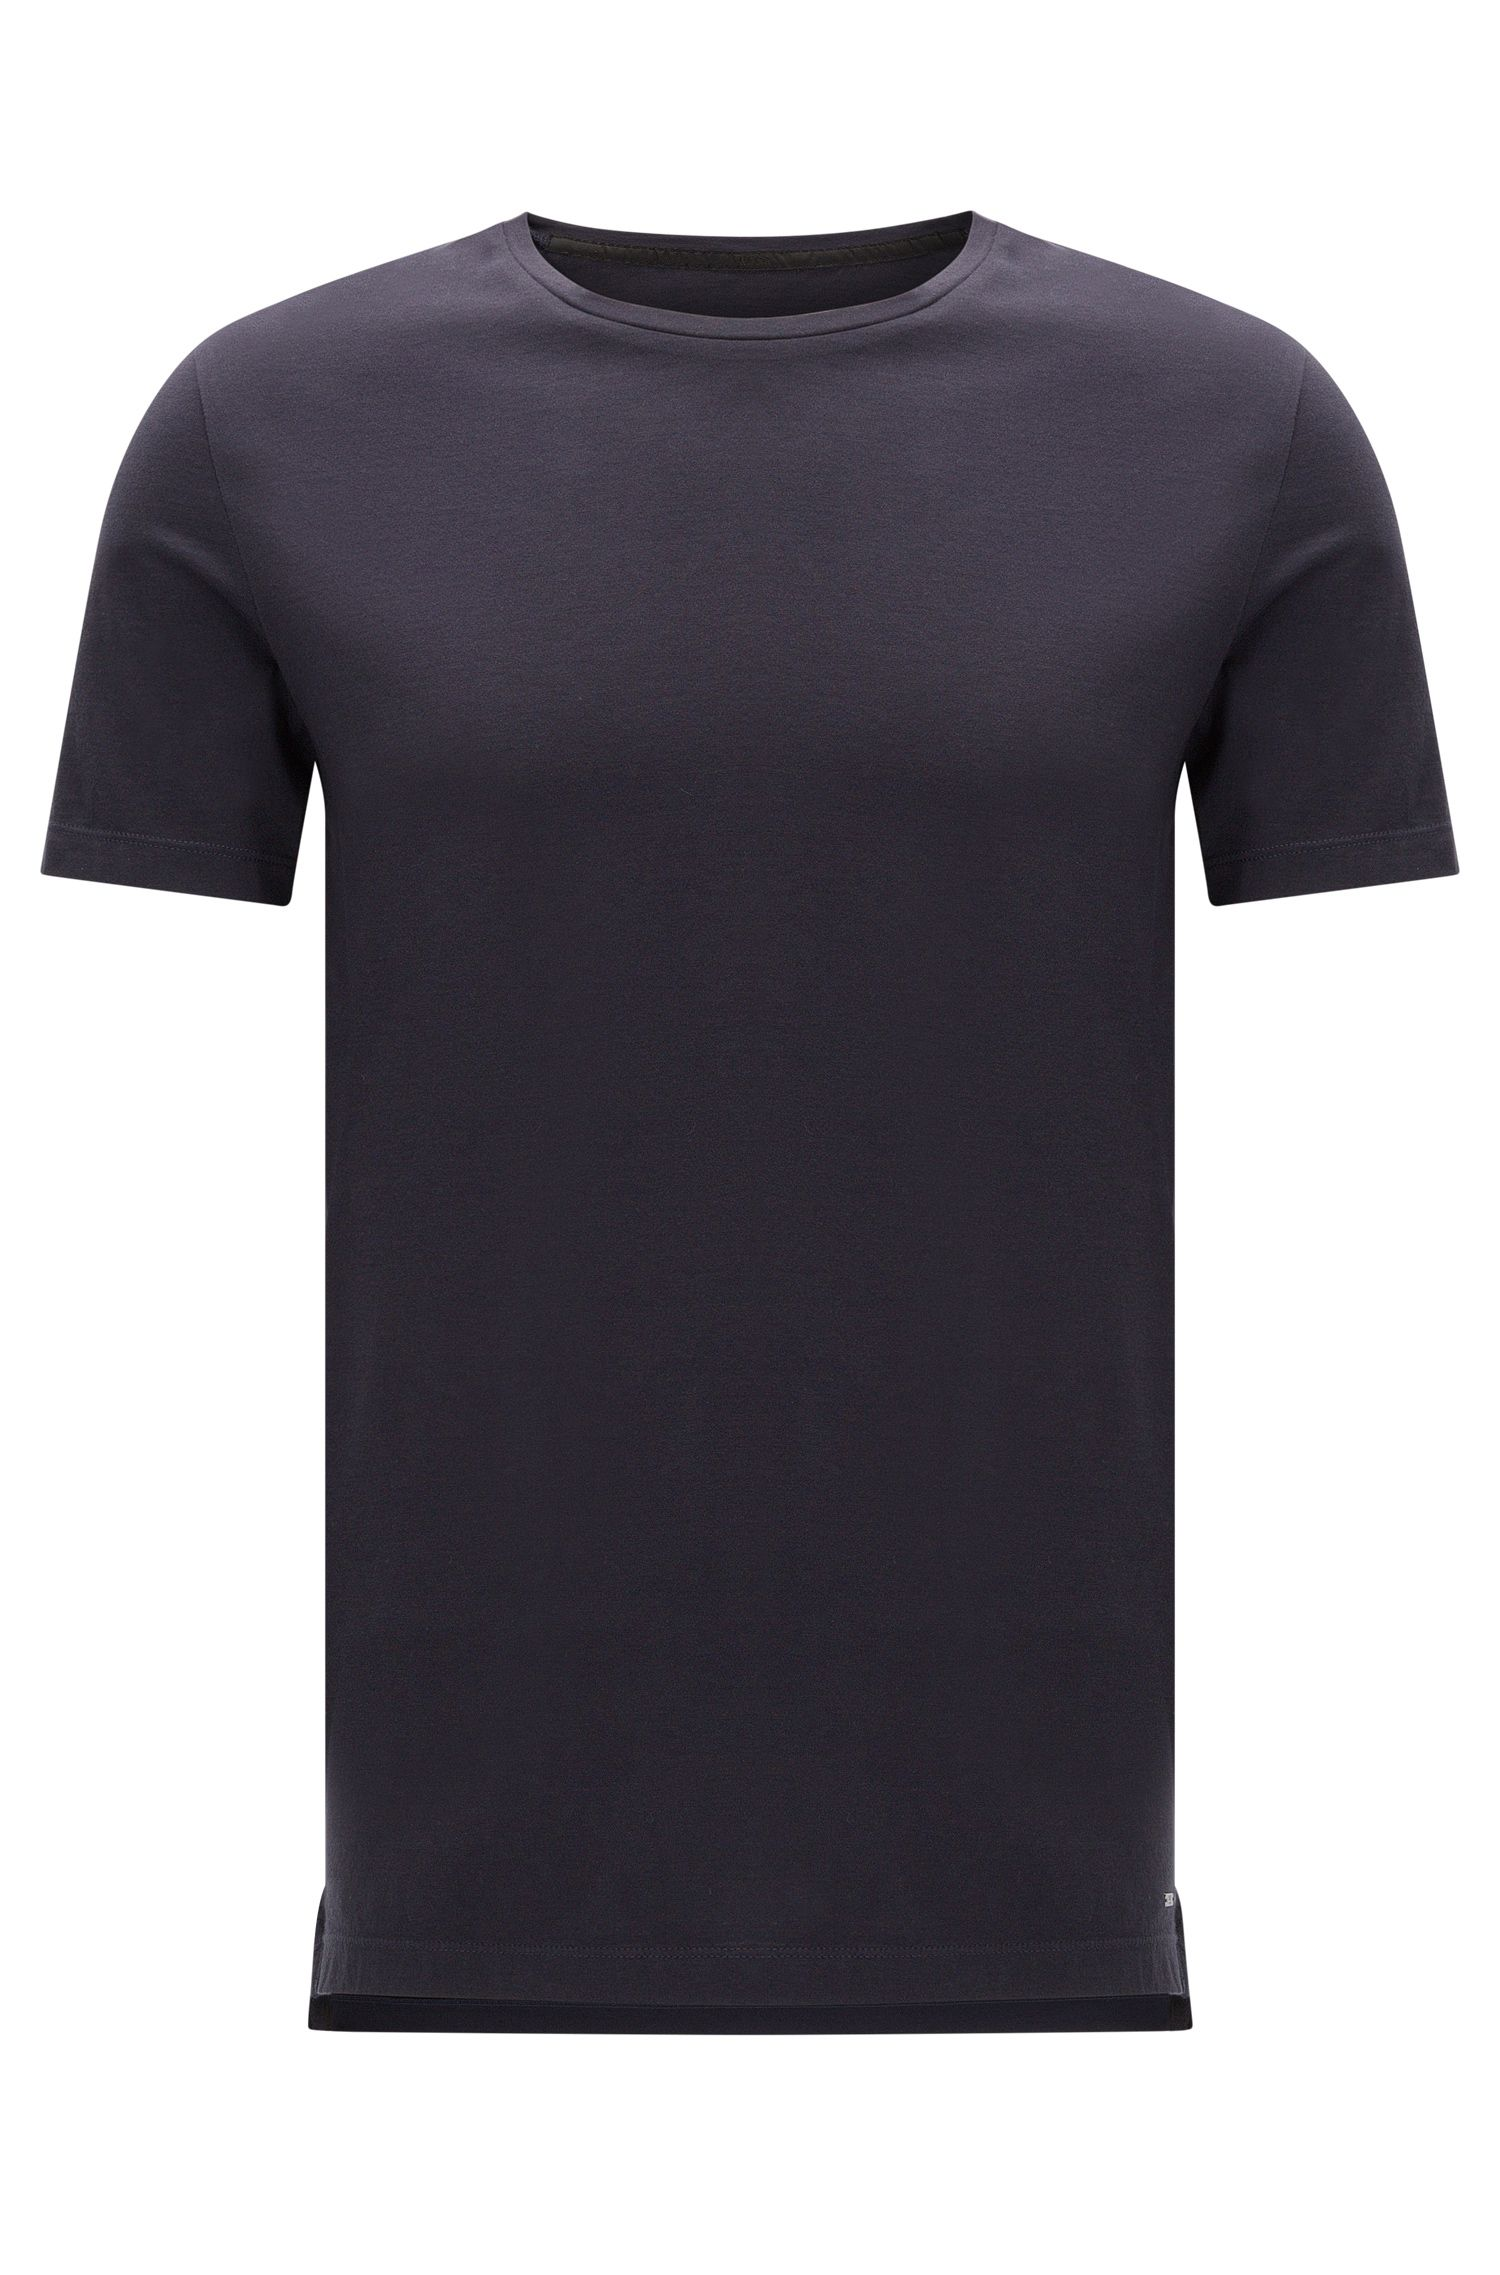 'Tessler WS' | Cotton T-Shirt